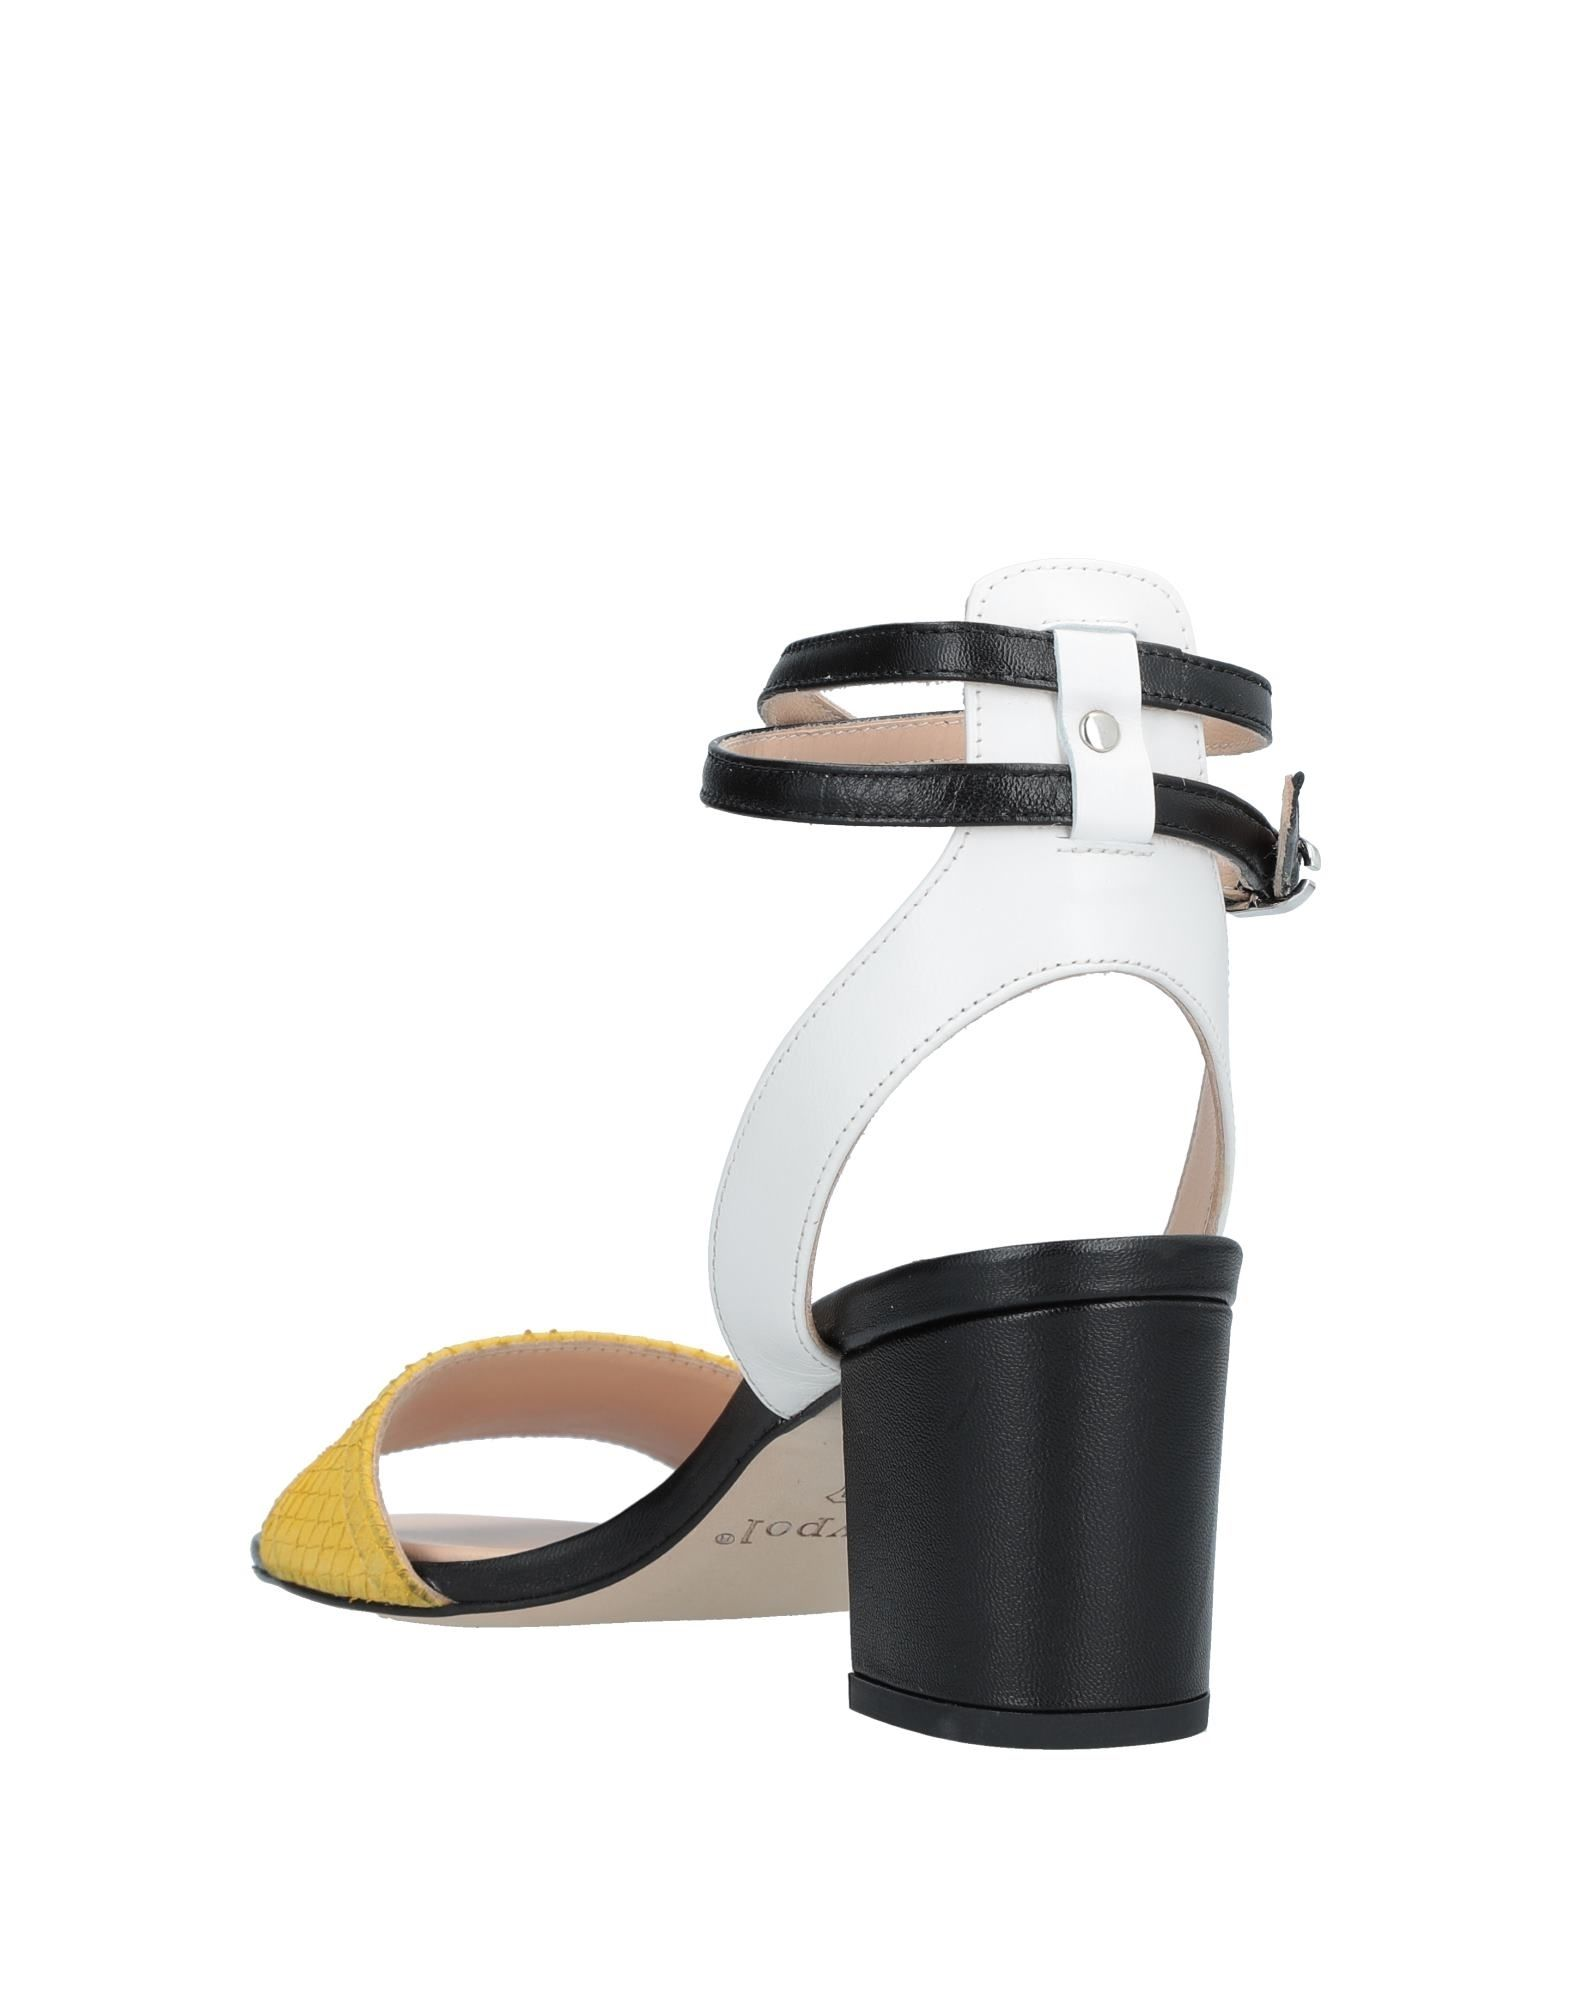 M&P Maypol 11532019VR Sandalen Damen  11532019VR Maypol Neue Schuhe b55615